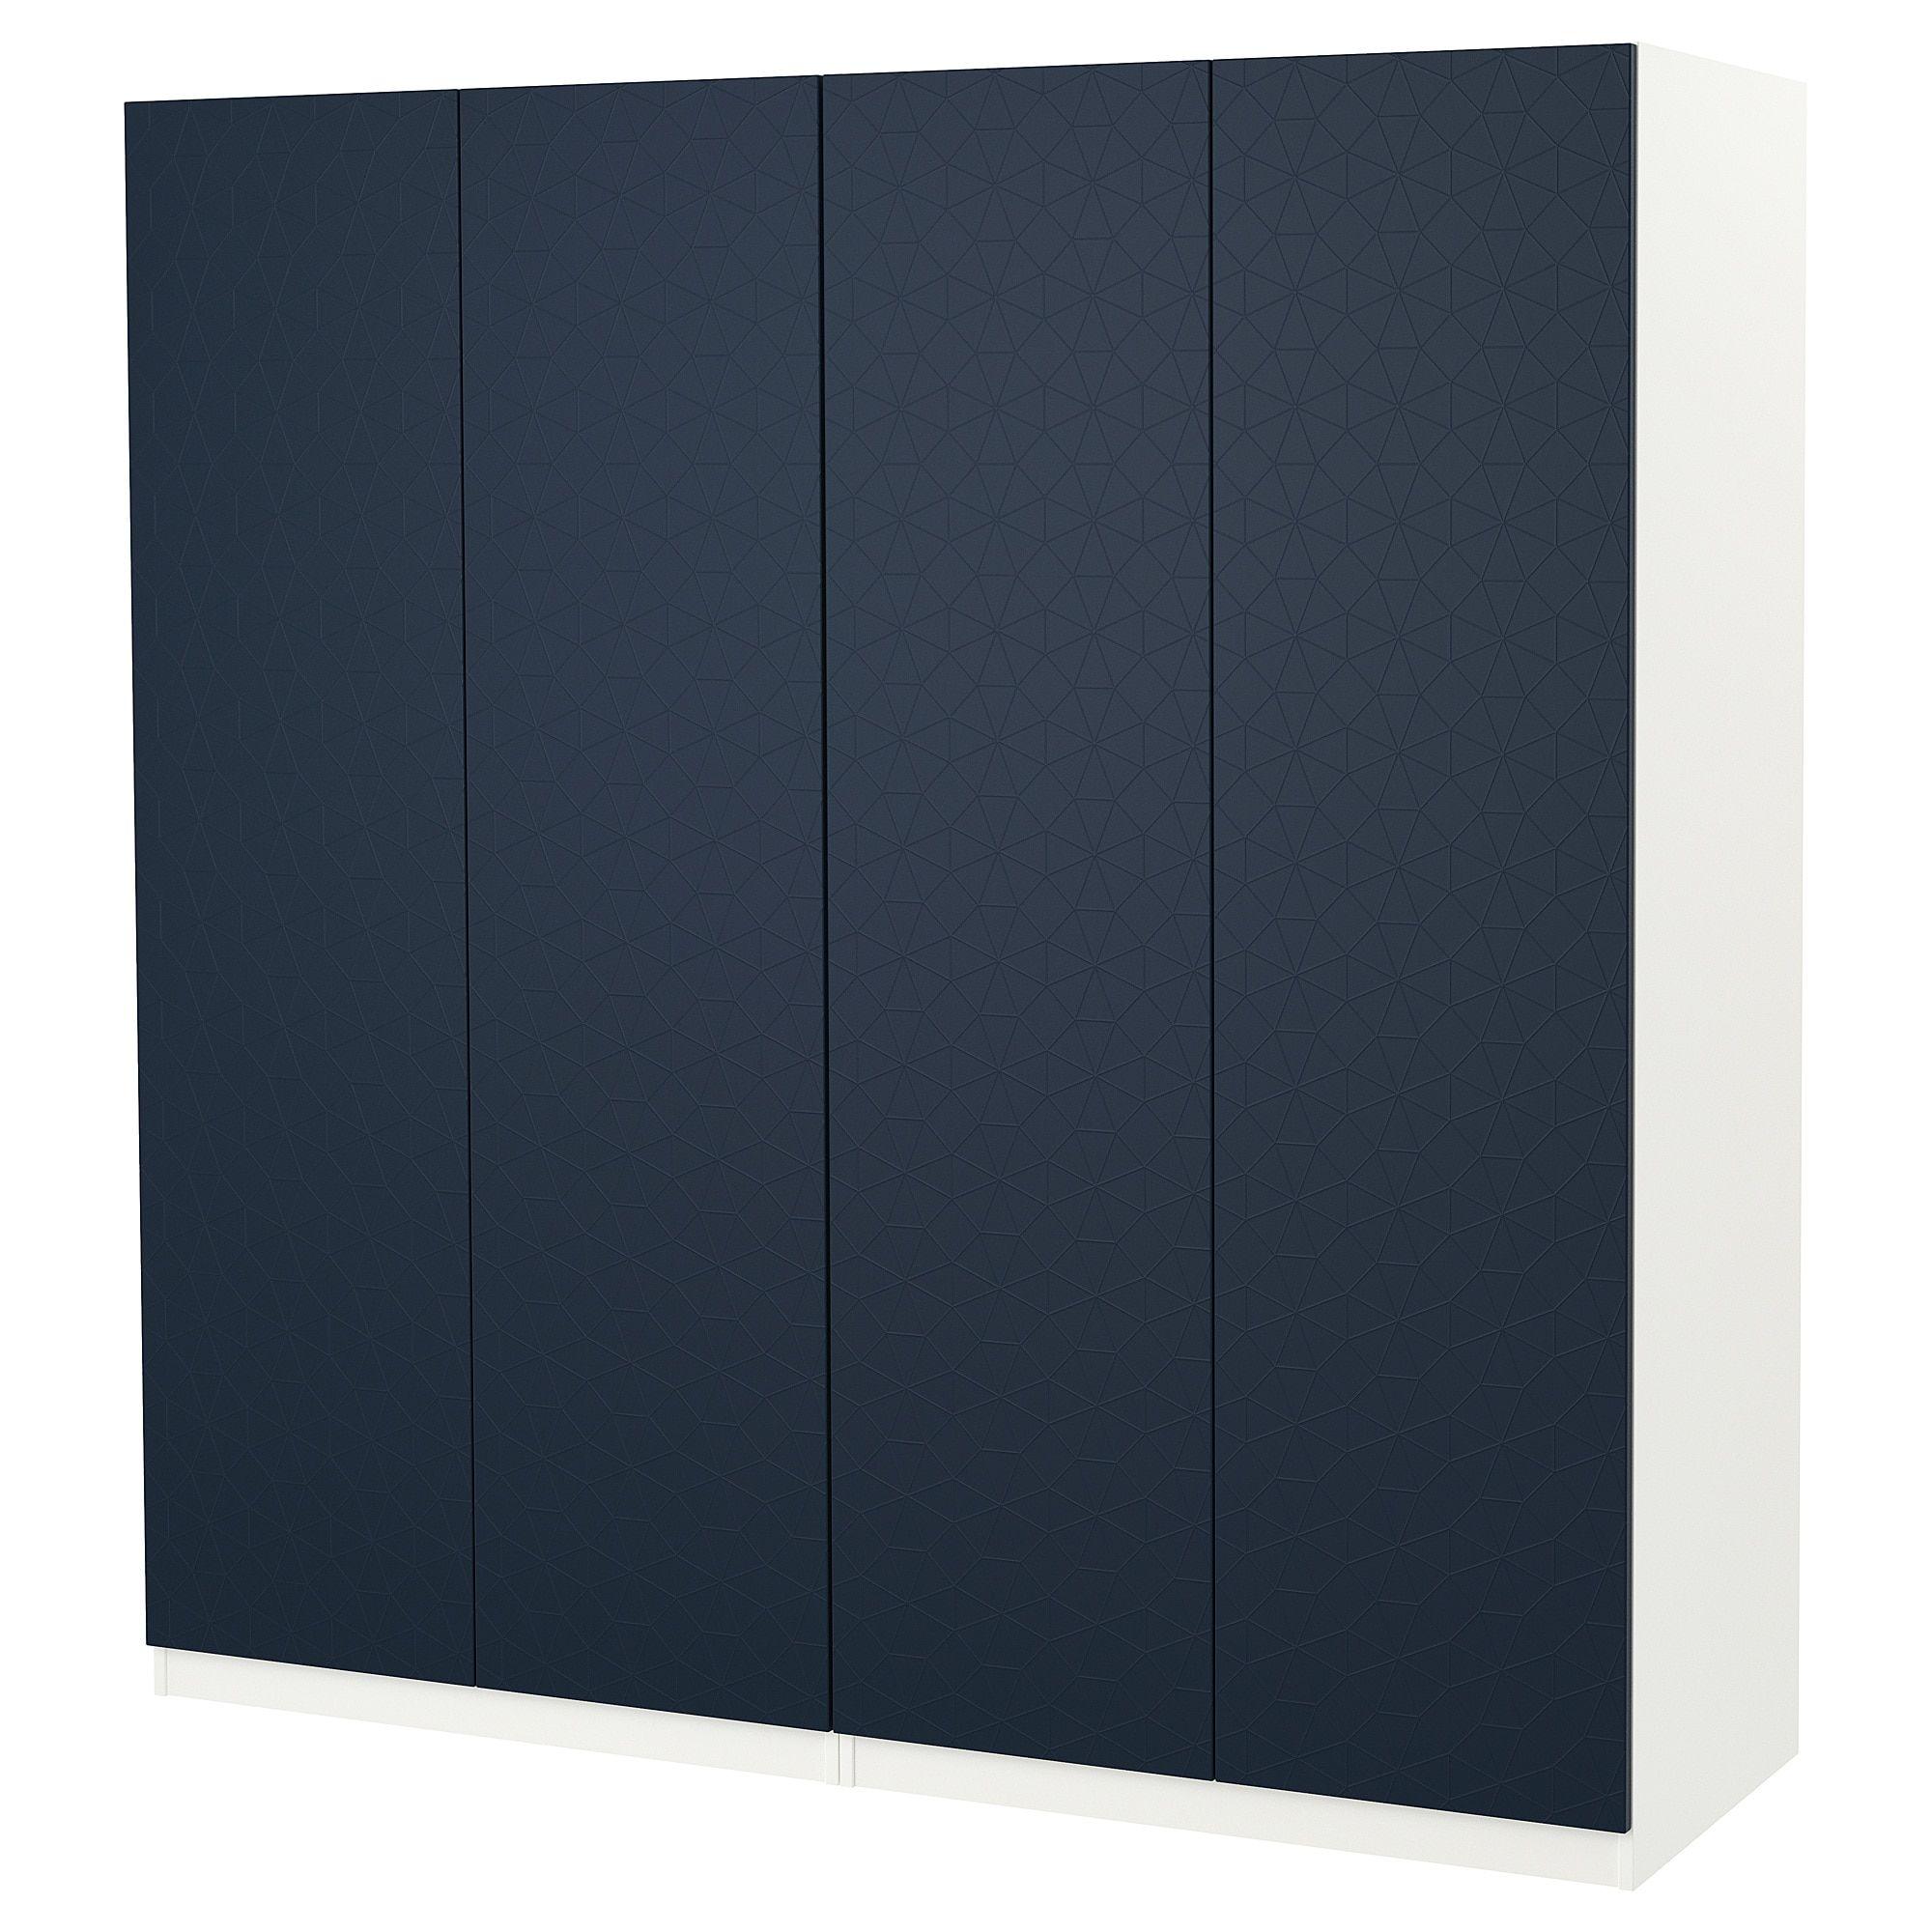 IKEA HAMNAS Black-Blue Door with hinges | Products in 2019